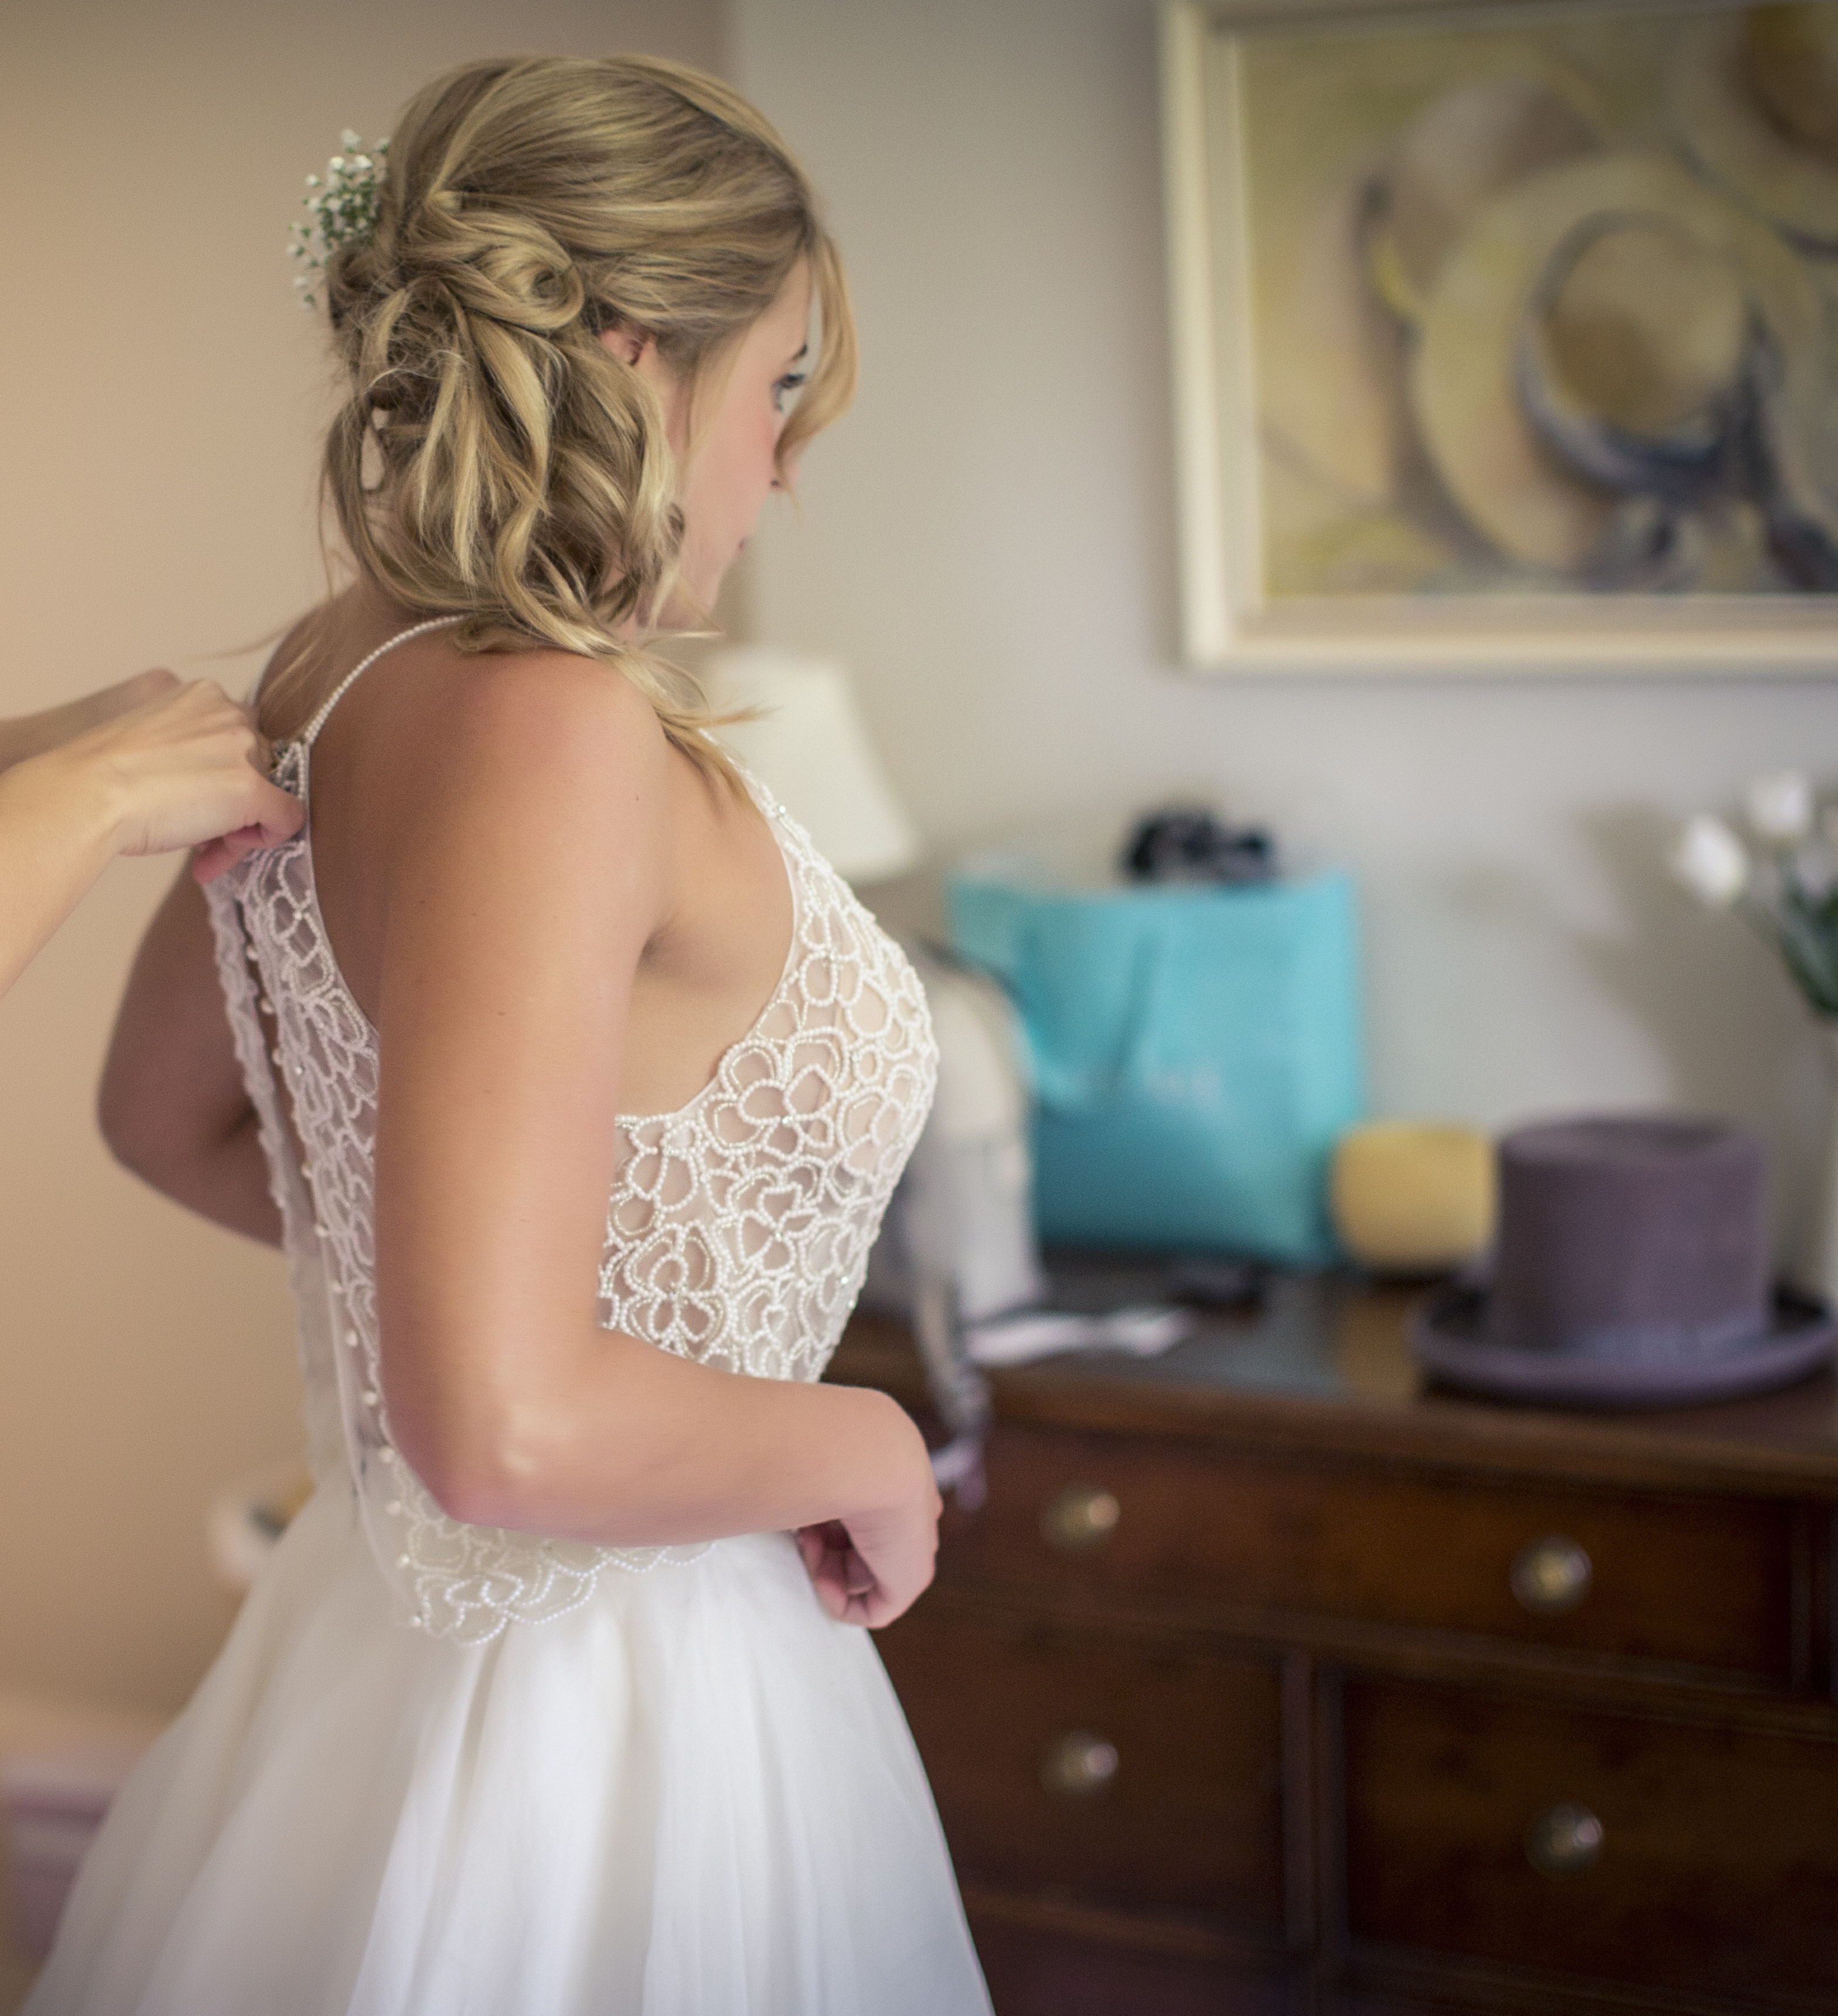 Bride Fiona